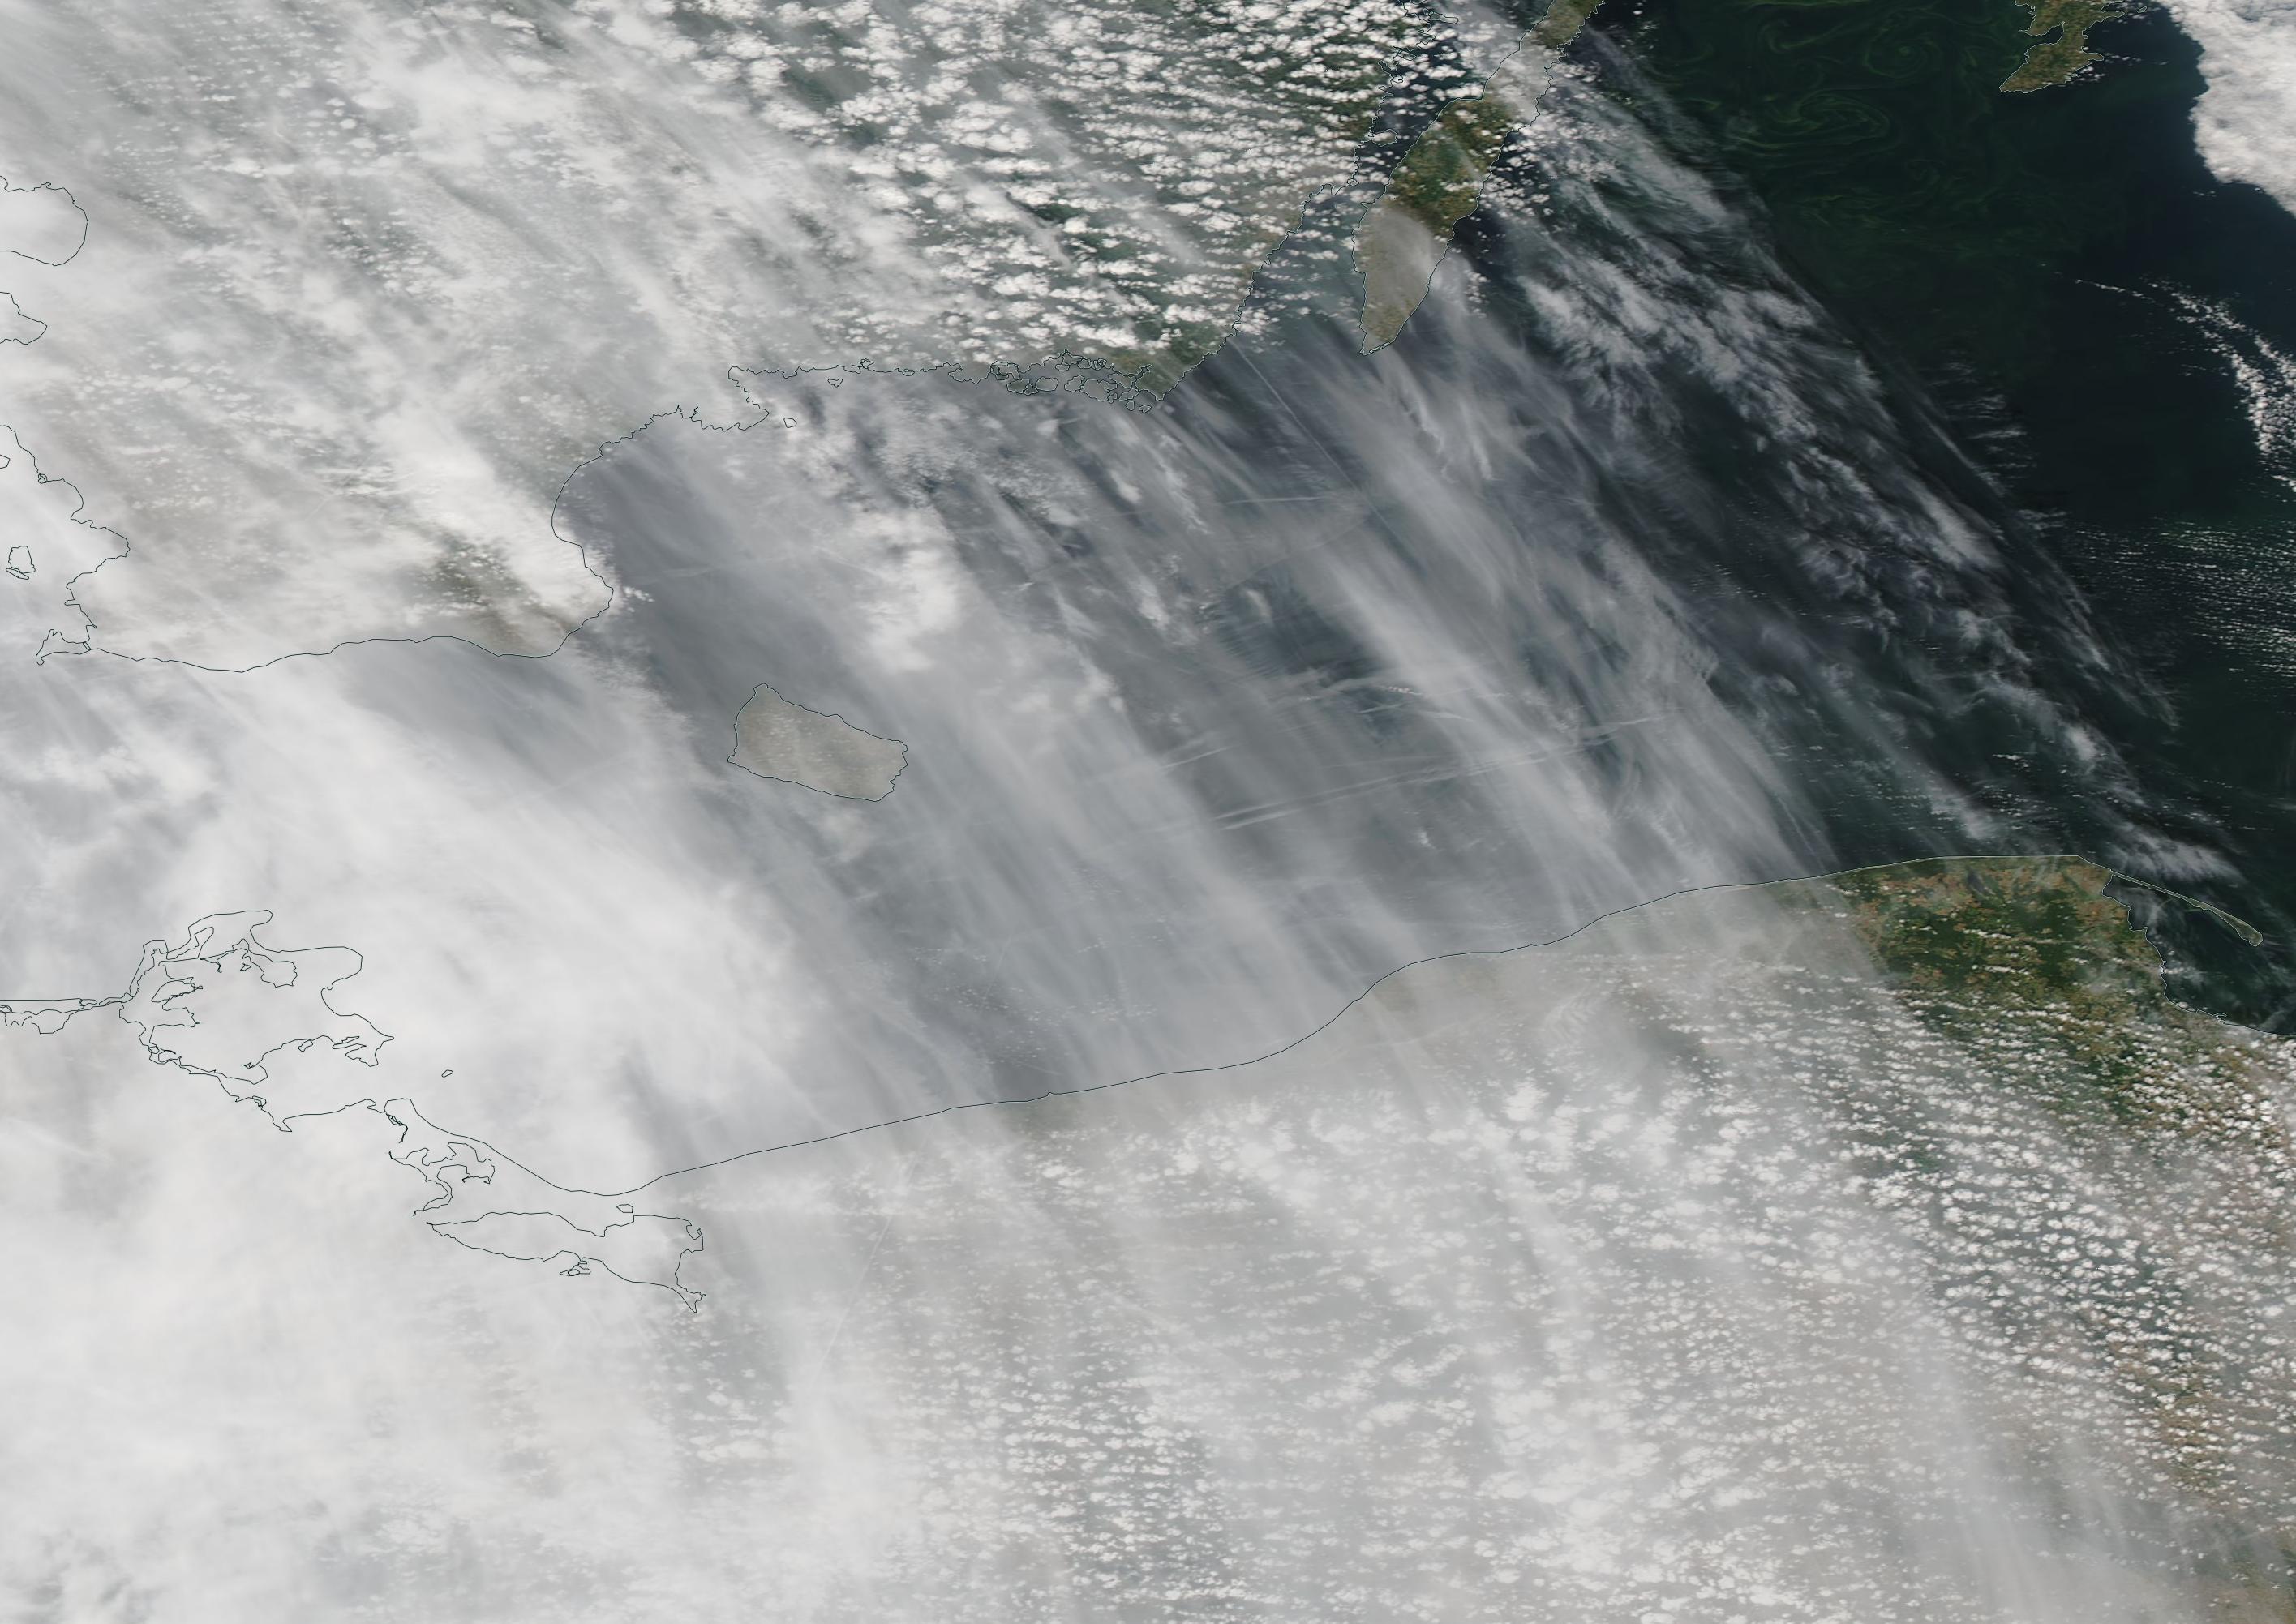 chemtrails Poland, Malmo, Stavanger, Gothenburg, Baltic Sea, Bornholm, Oland chemtrail geoengineering 22 july 2019 https://go.nasa.gov/2M8rxPq